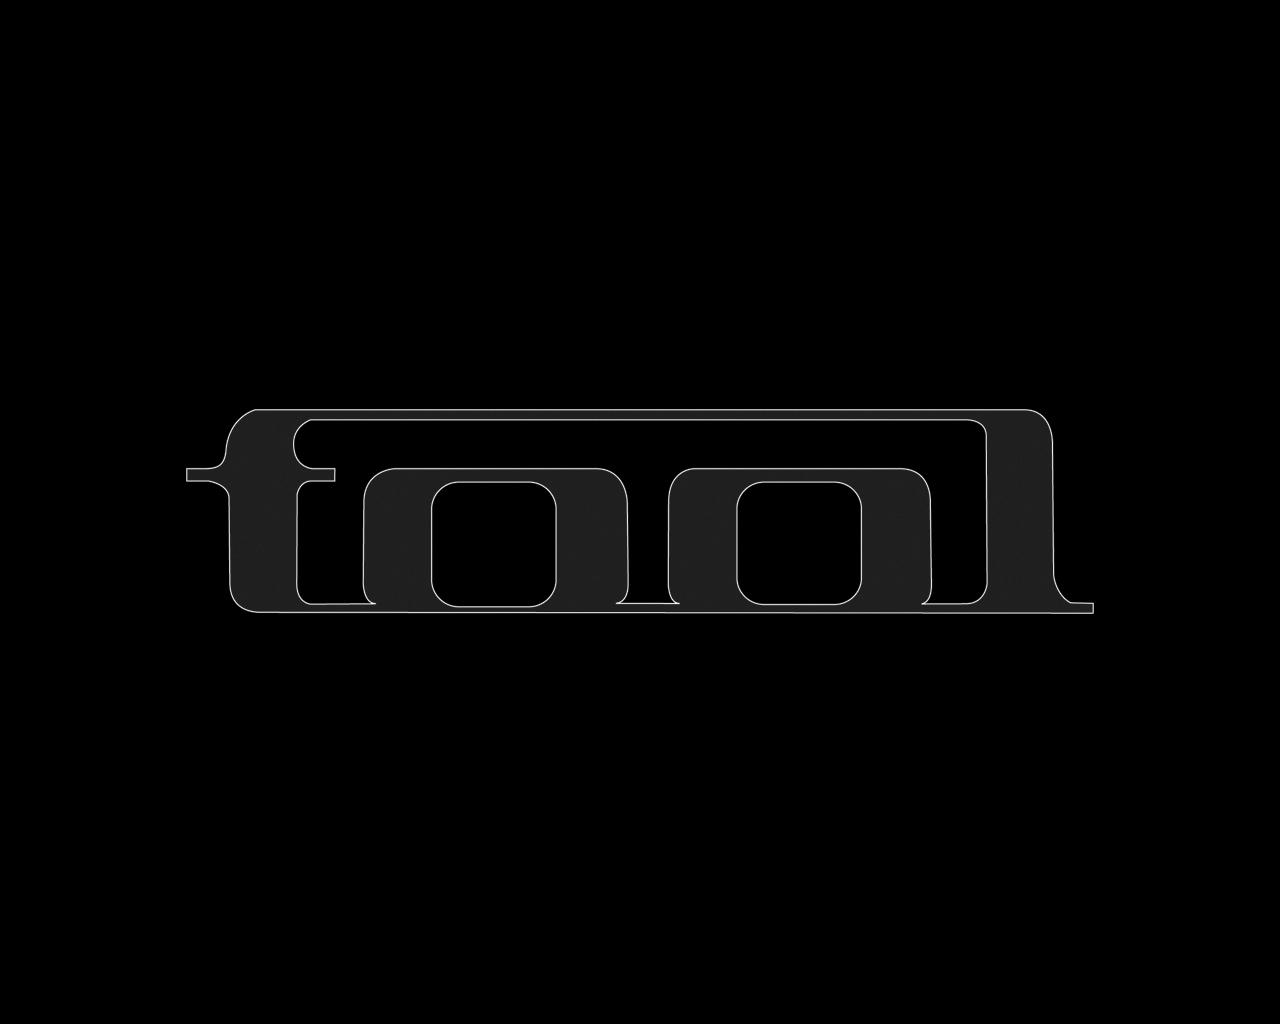 tool - photo #11